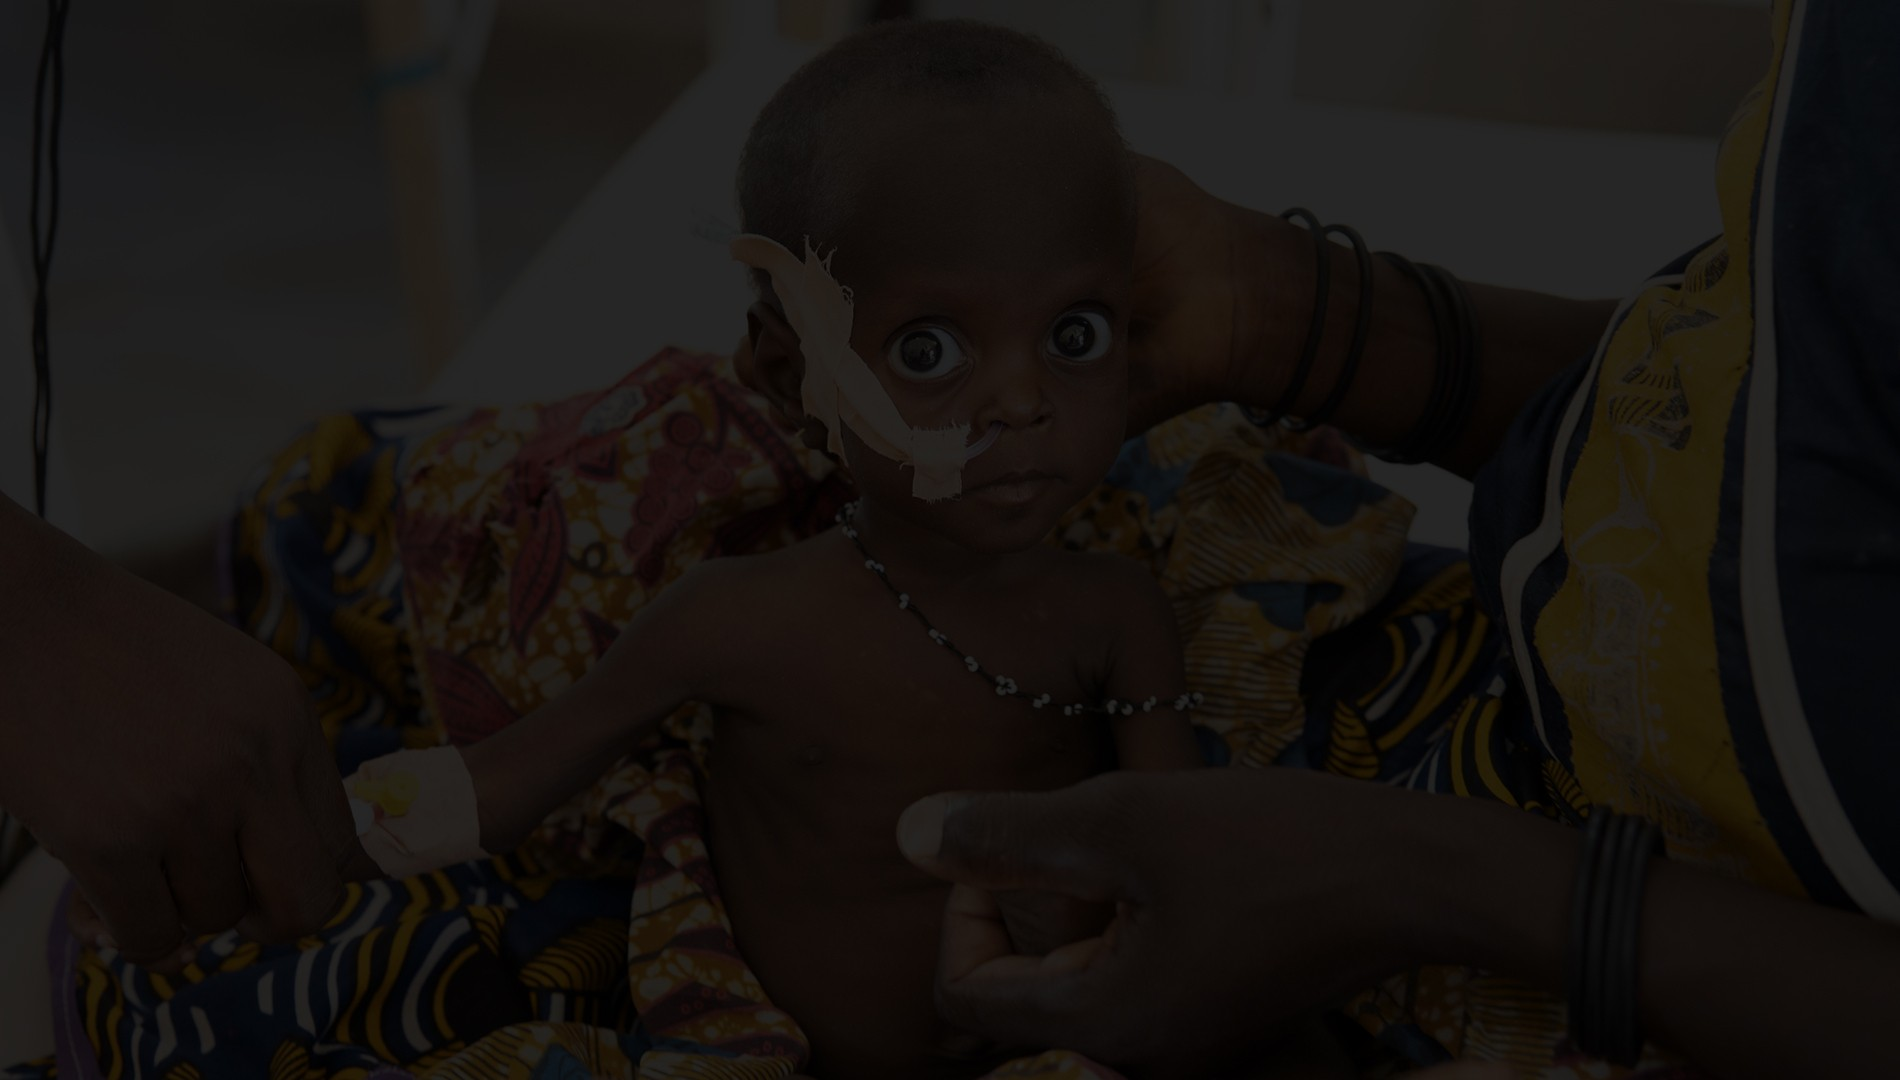 UNICEF-Polska-Niger-LP-bg.jpg